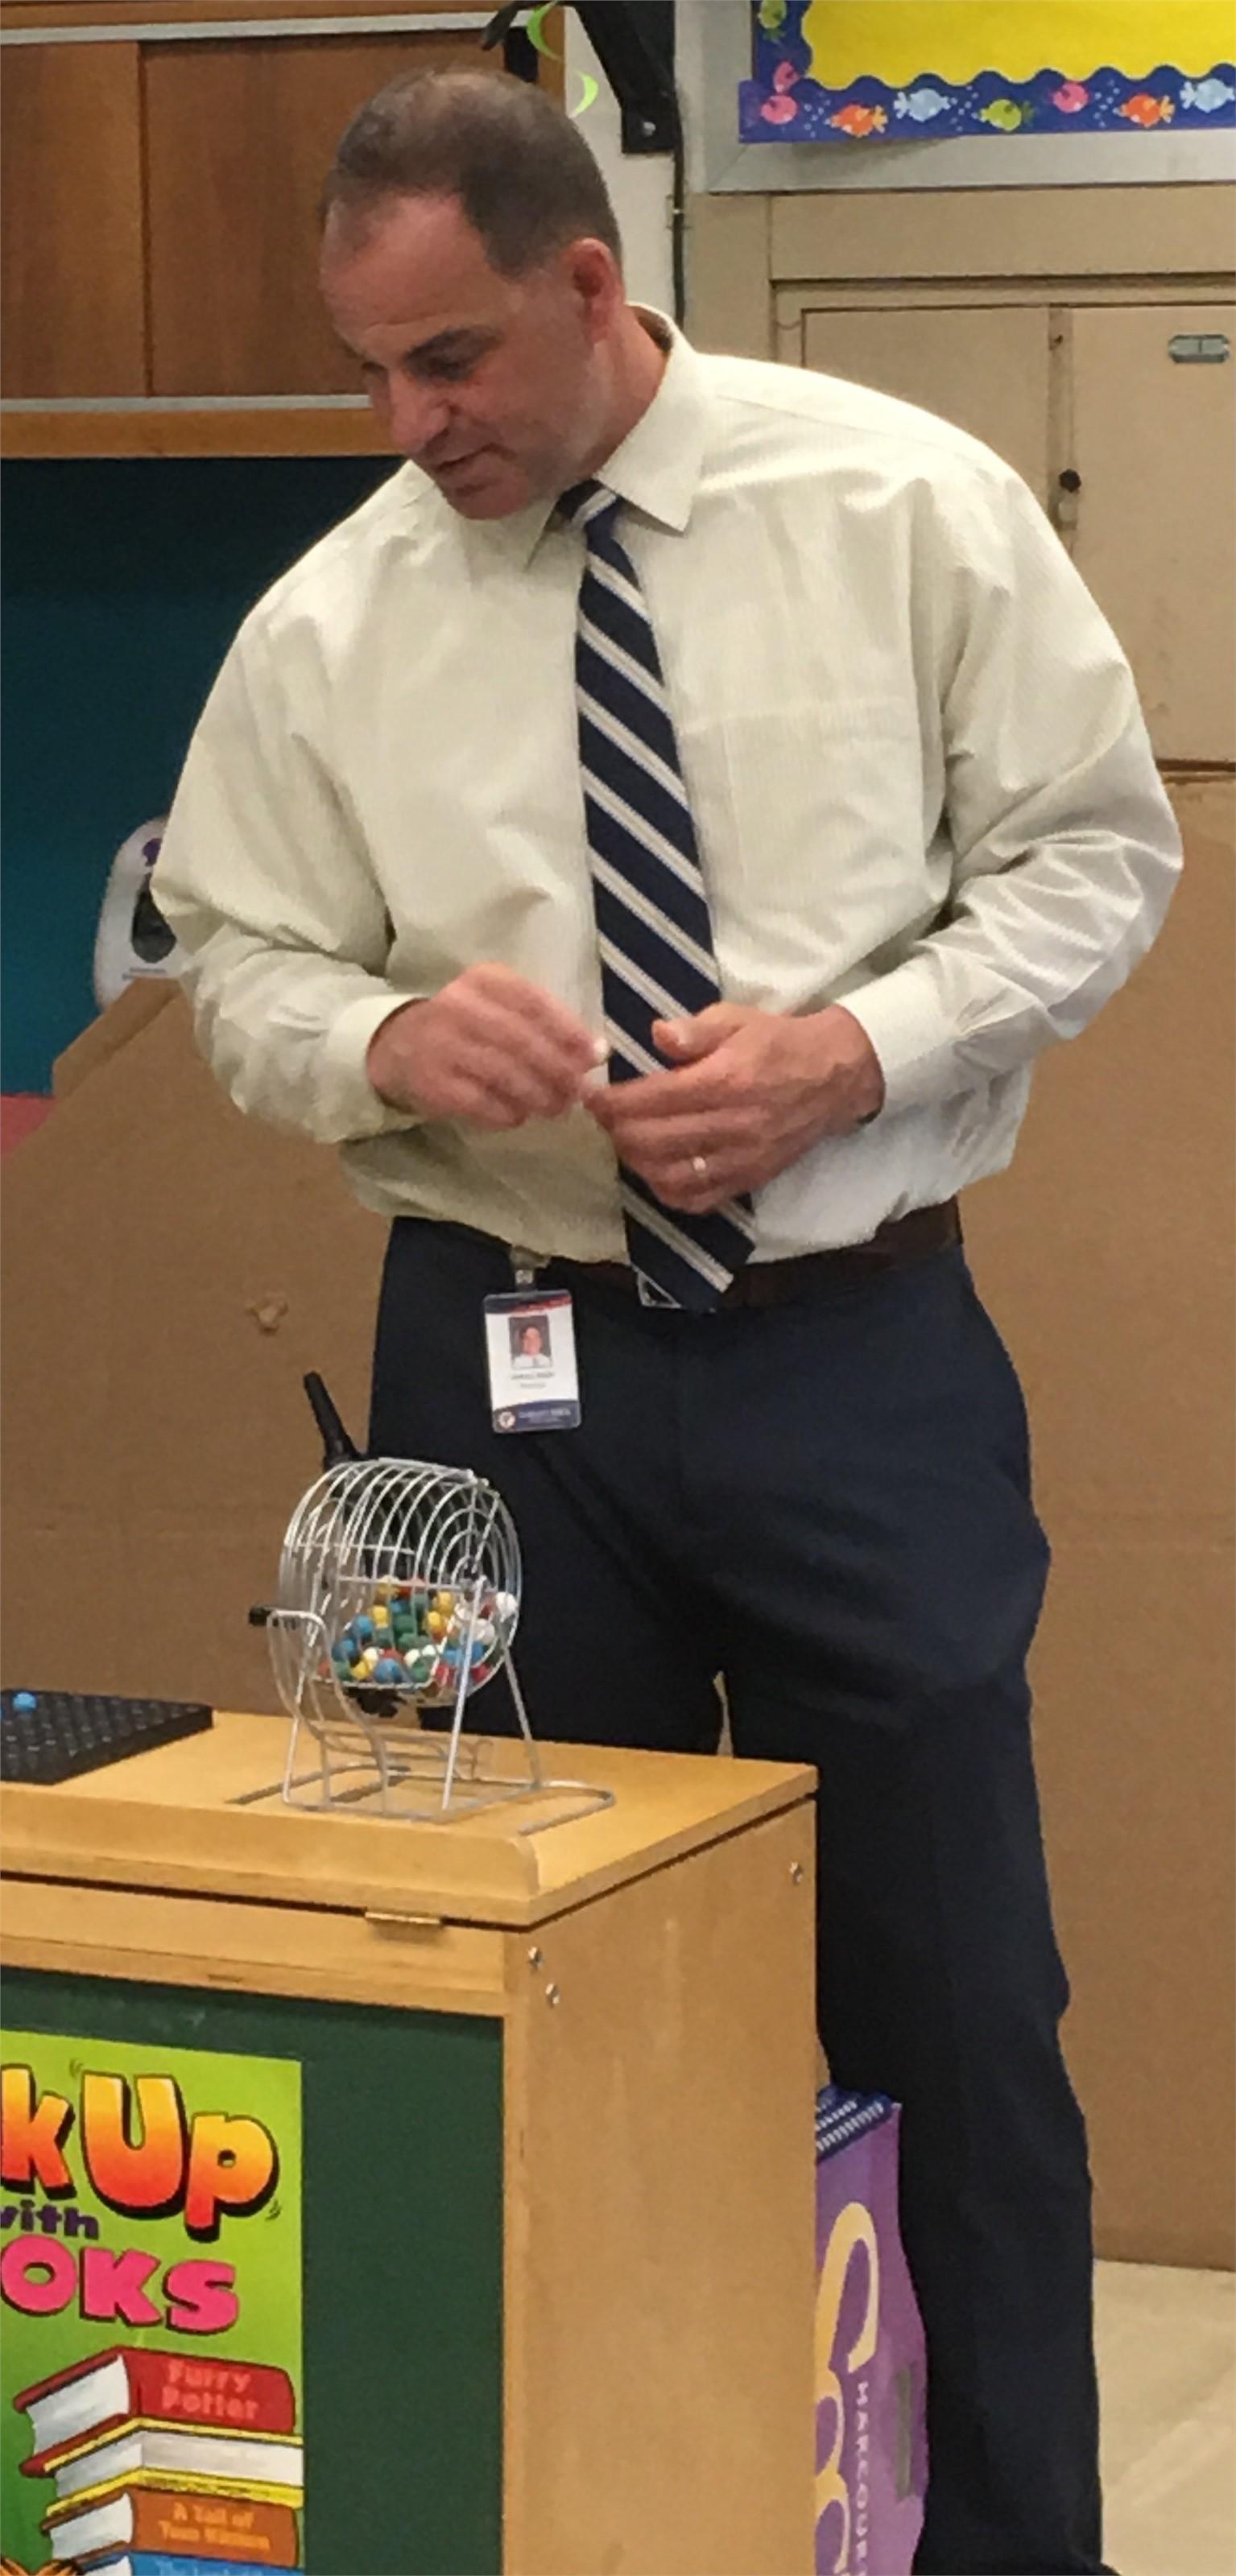 Mr. Rojik calls bingo during the end-of-year celebration